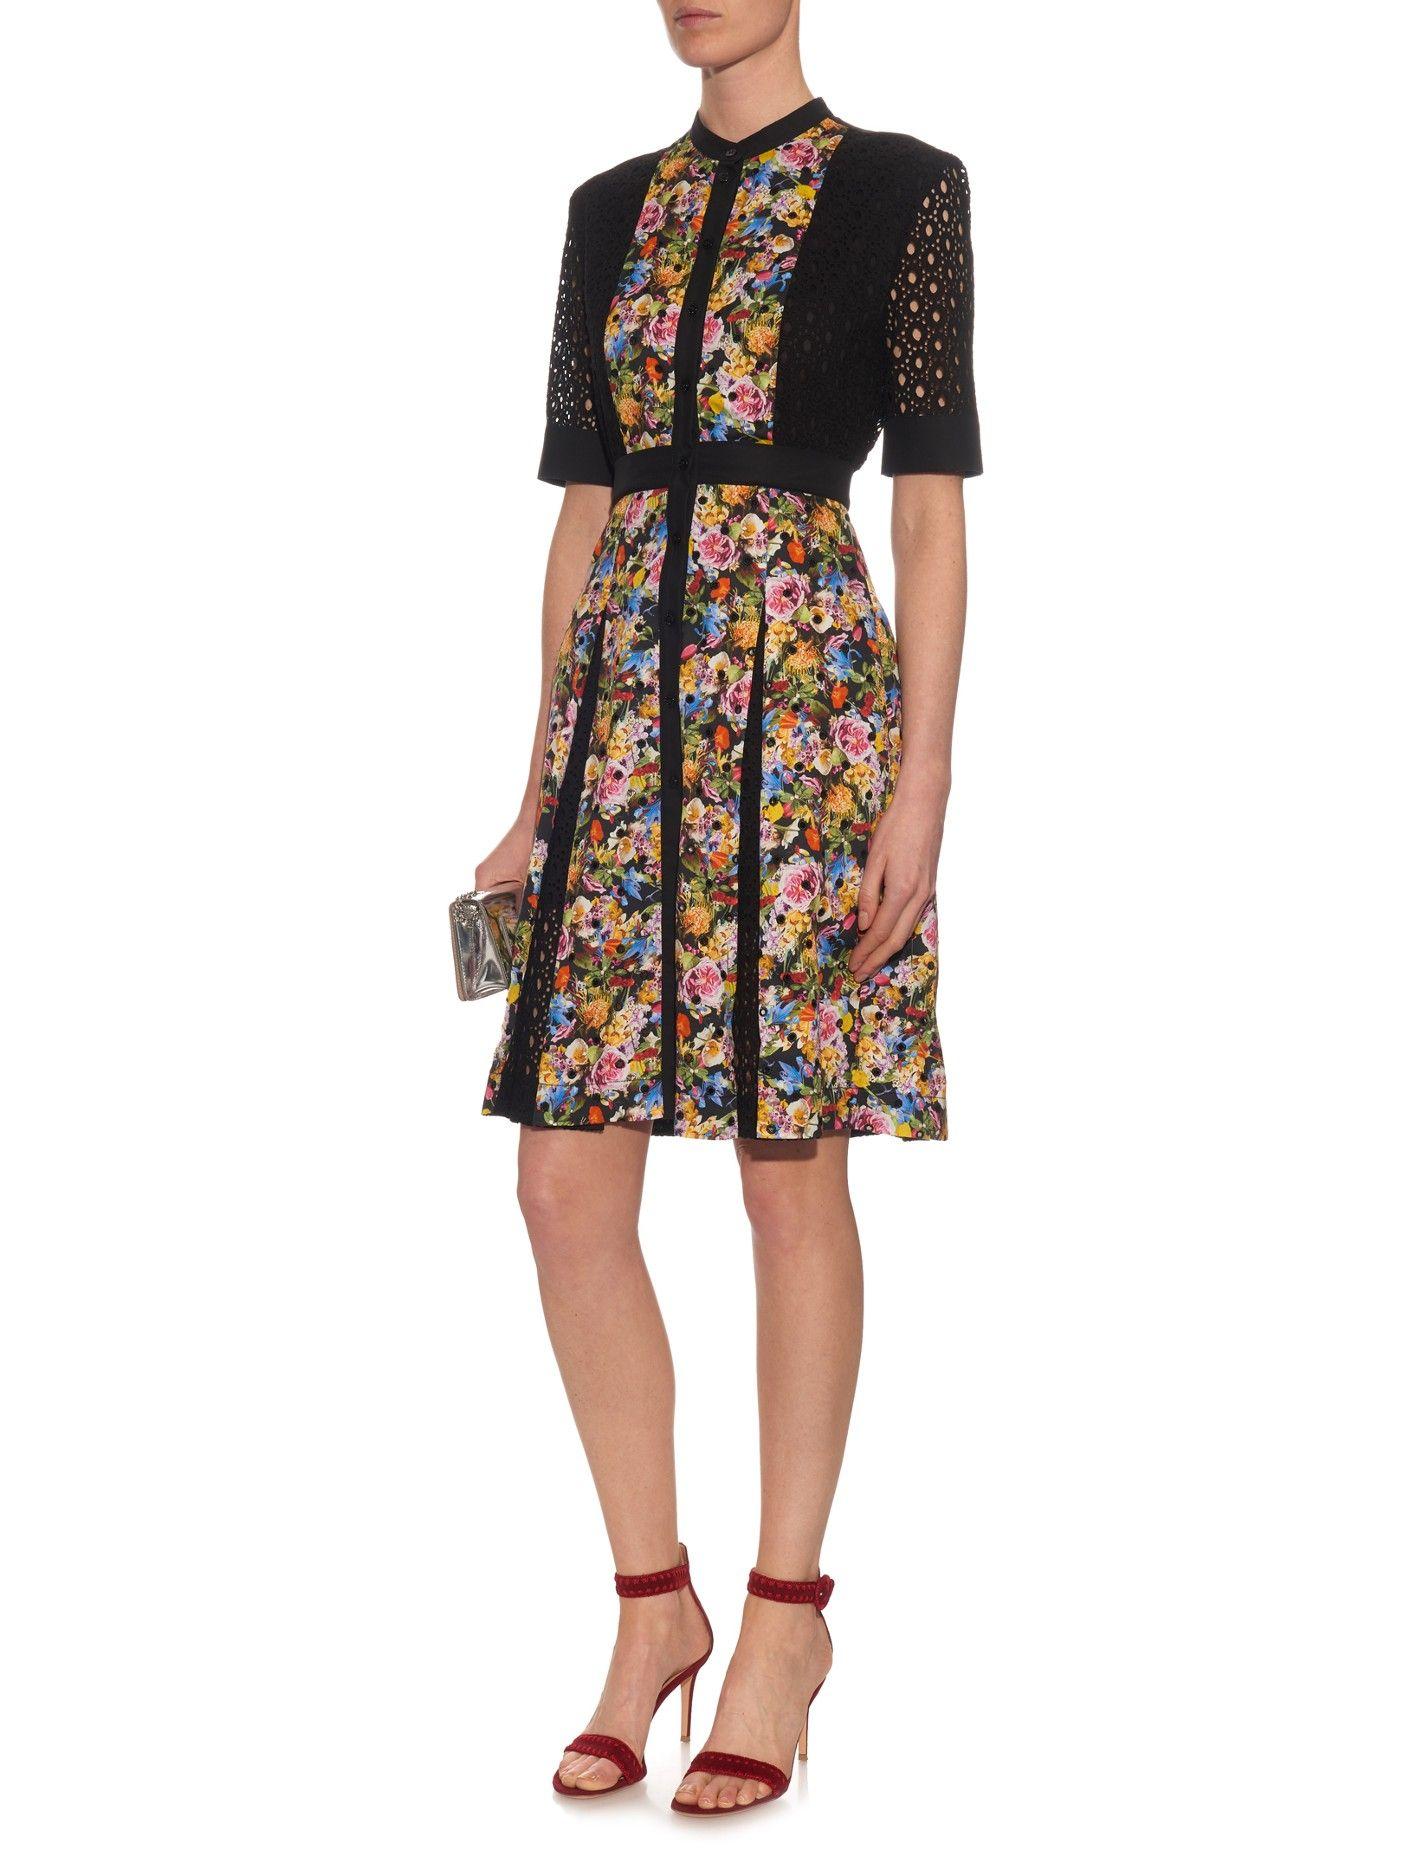 Caule floral-print broderie-anglaise dress | Mary Katrantzou | MATCHESFASHION.COM UK